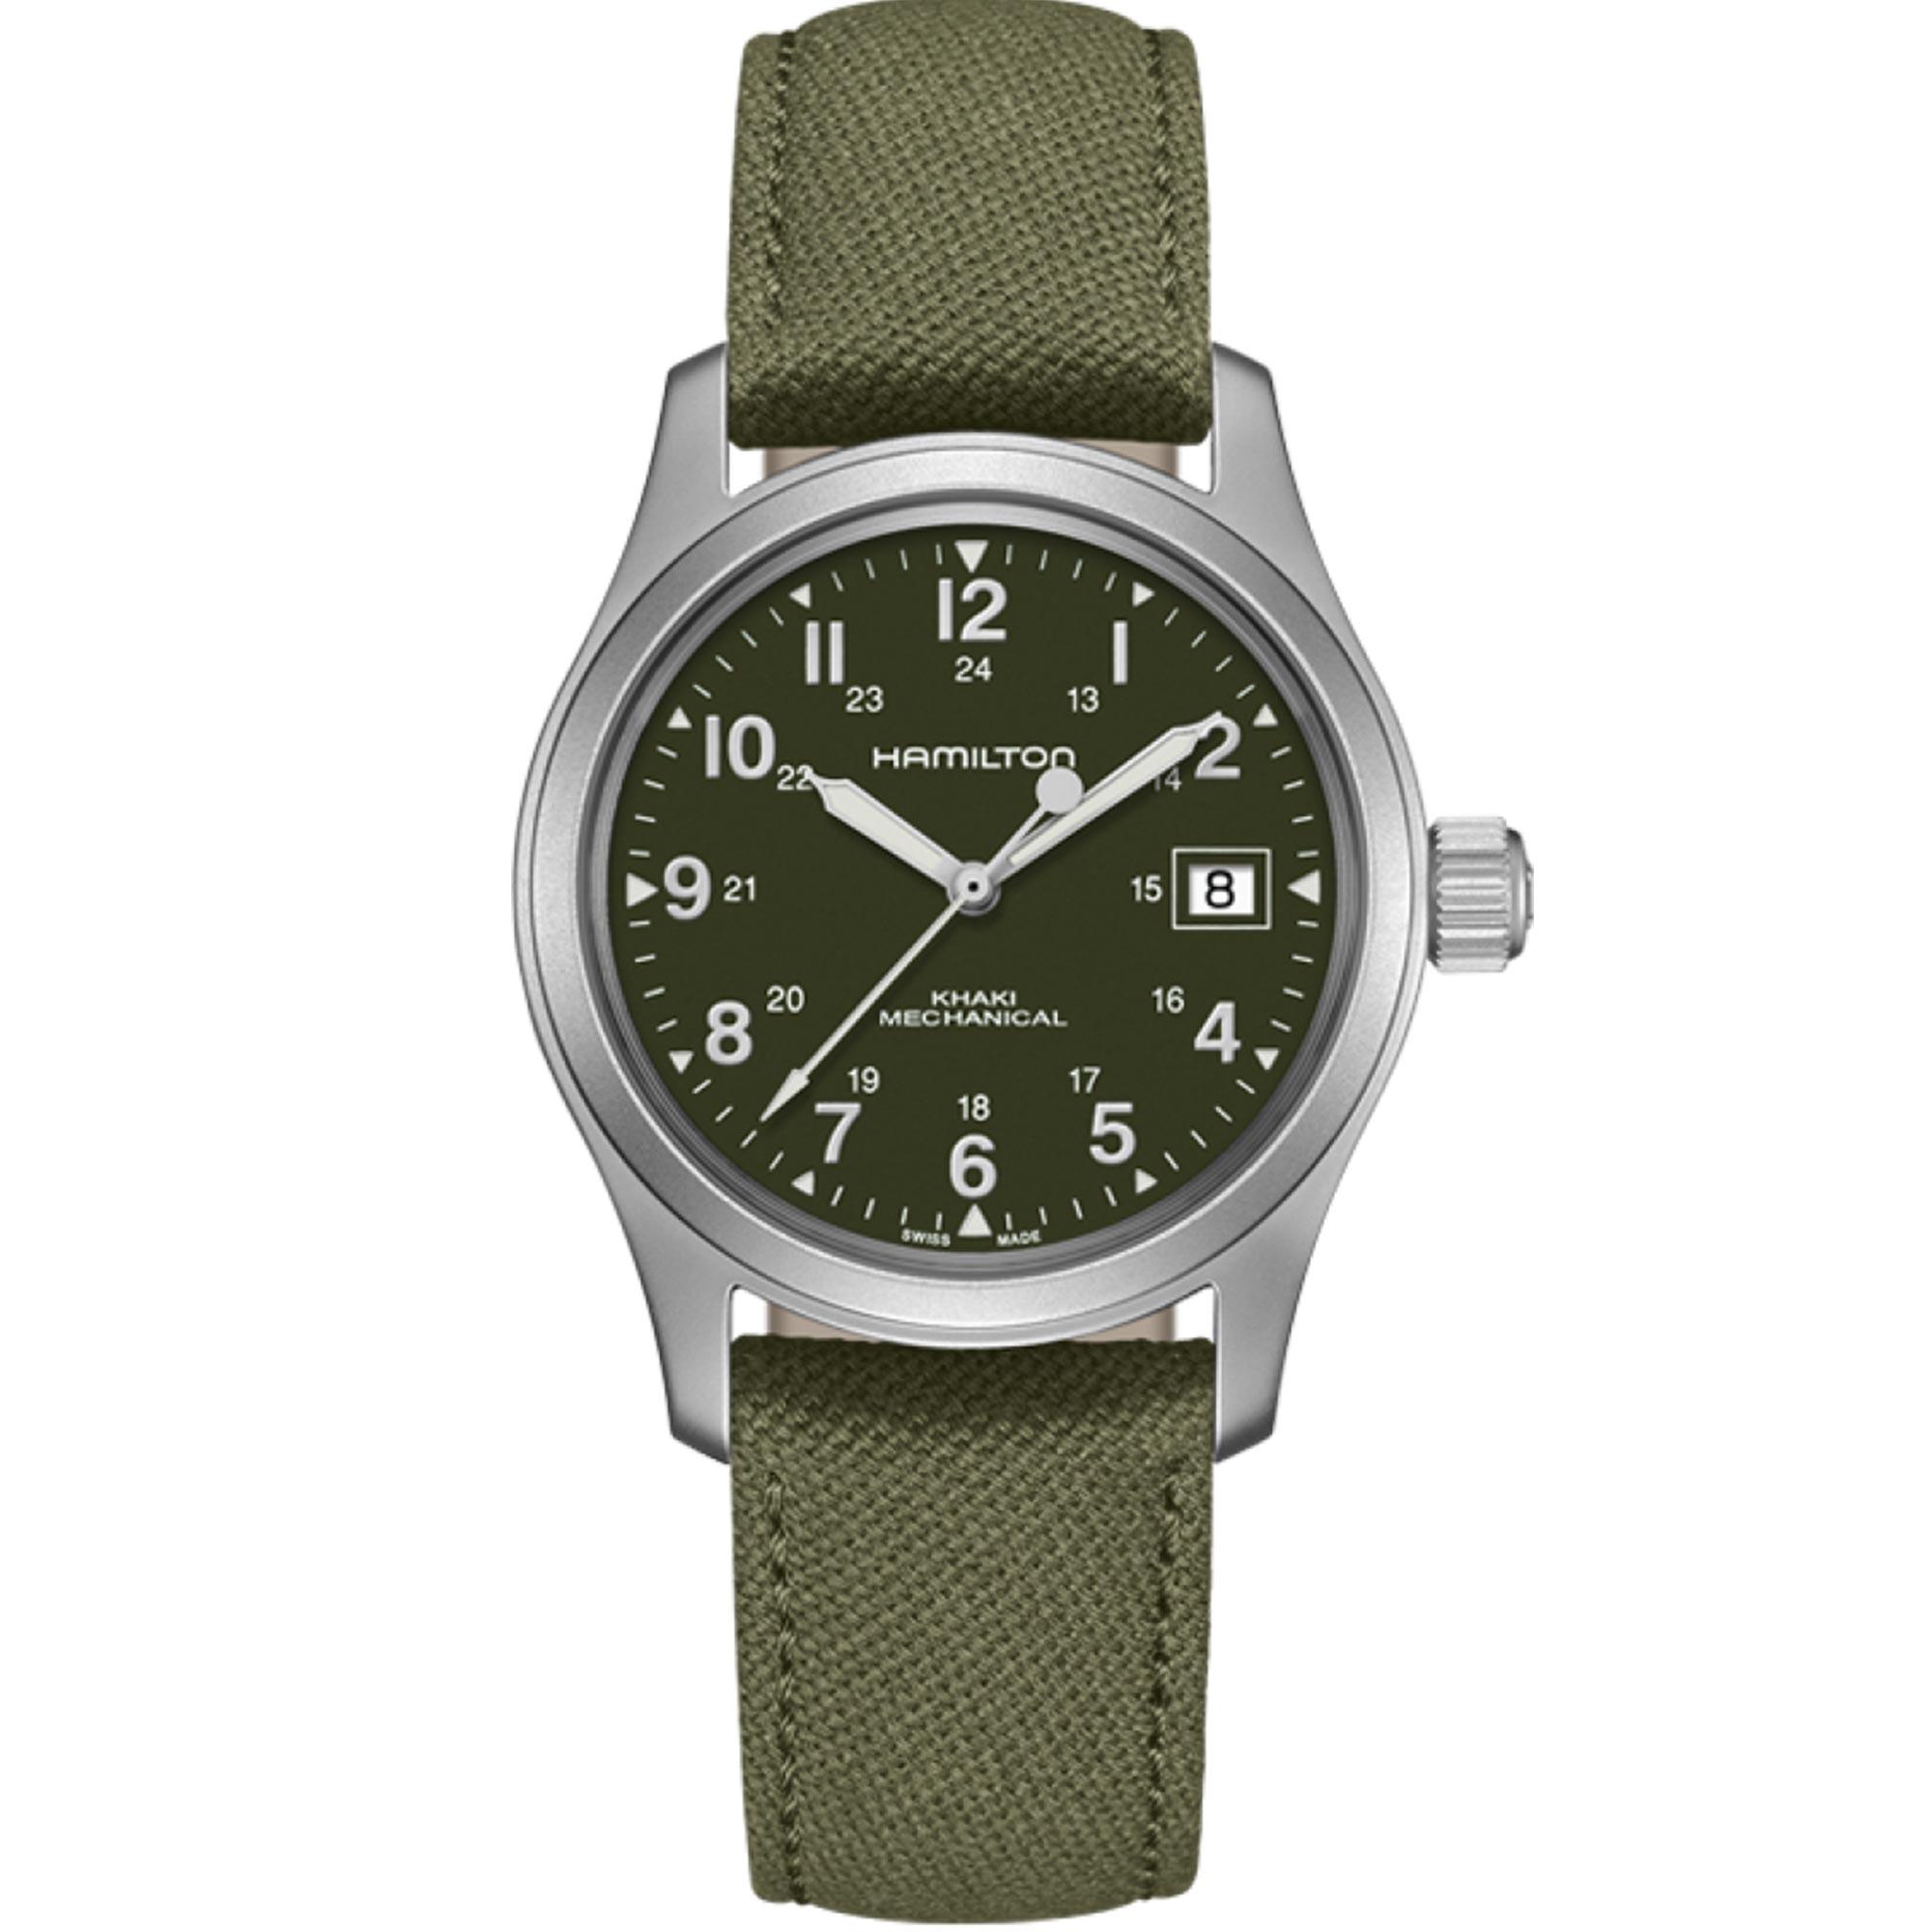 Hamilton Khaki Field Officer Mechanical Green Dial Canvas Strap Men's Watch H69439363 RRP £395